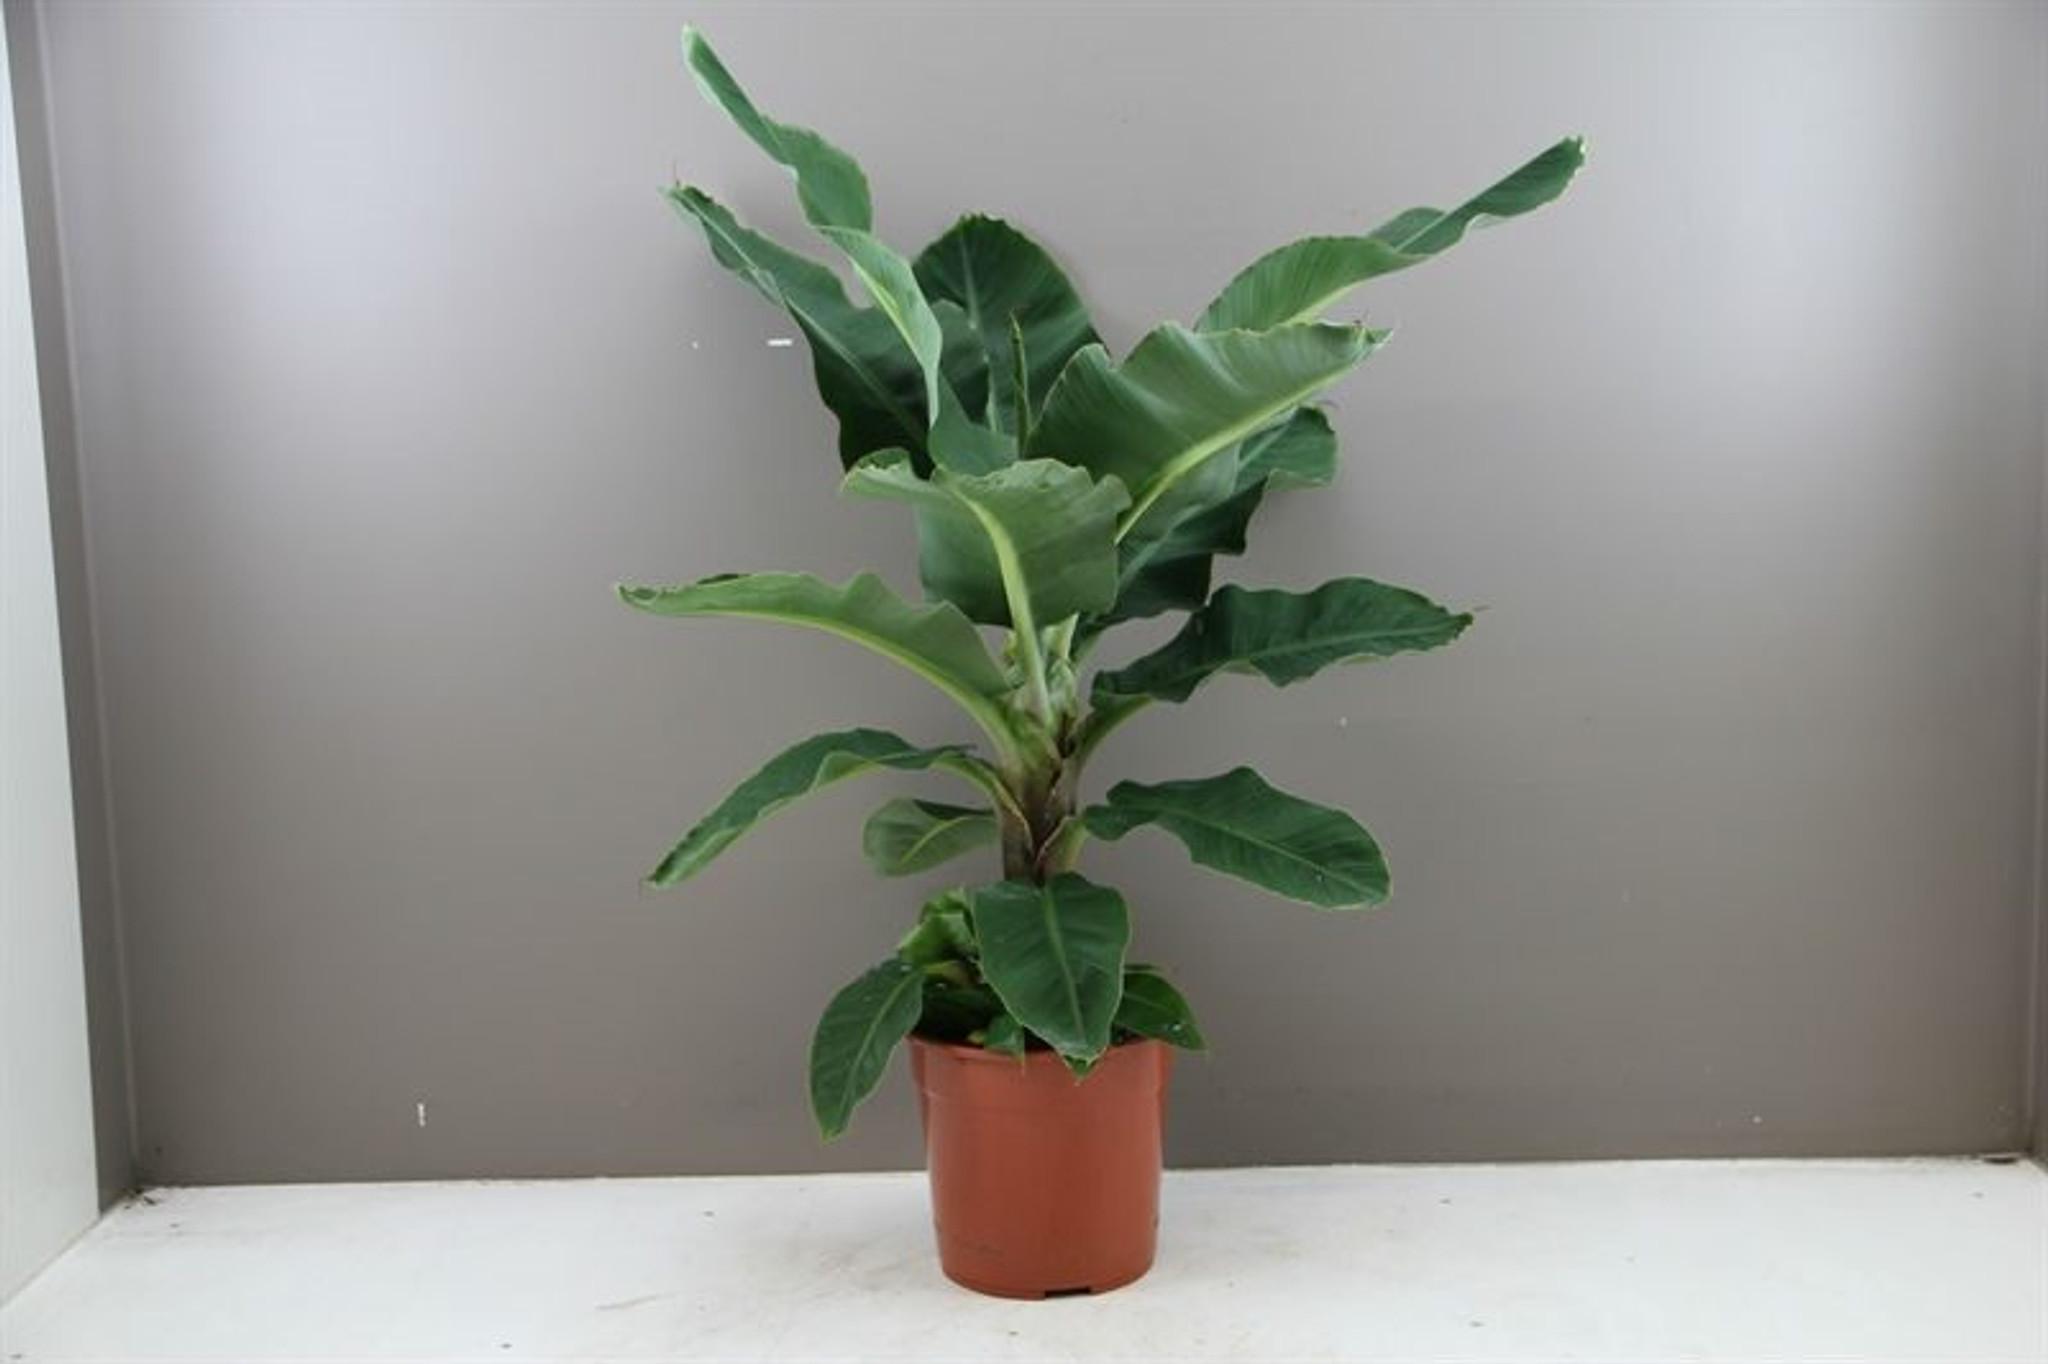 Large banana tree